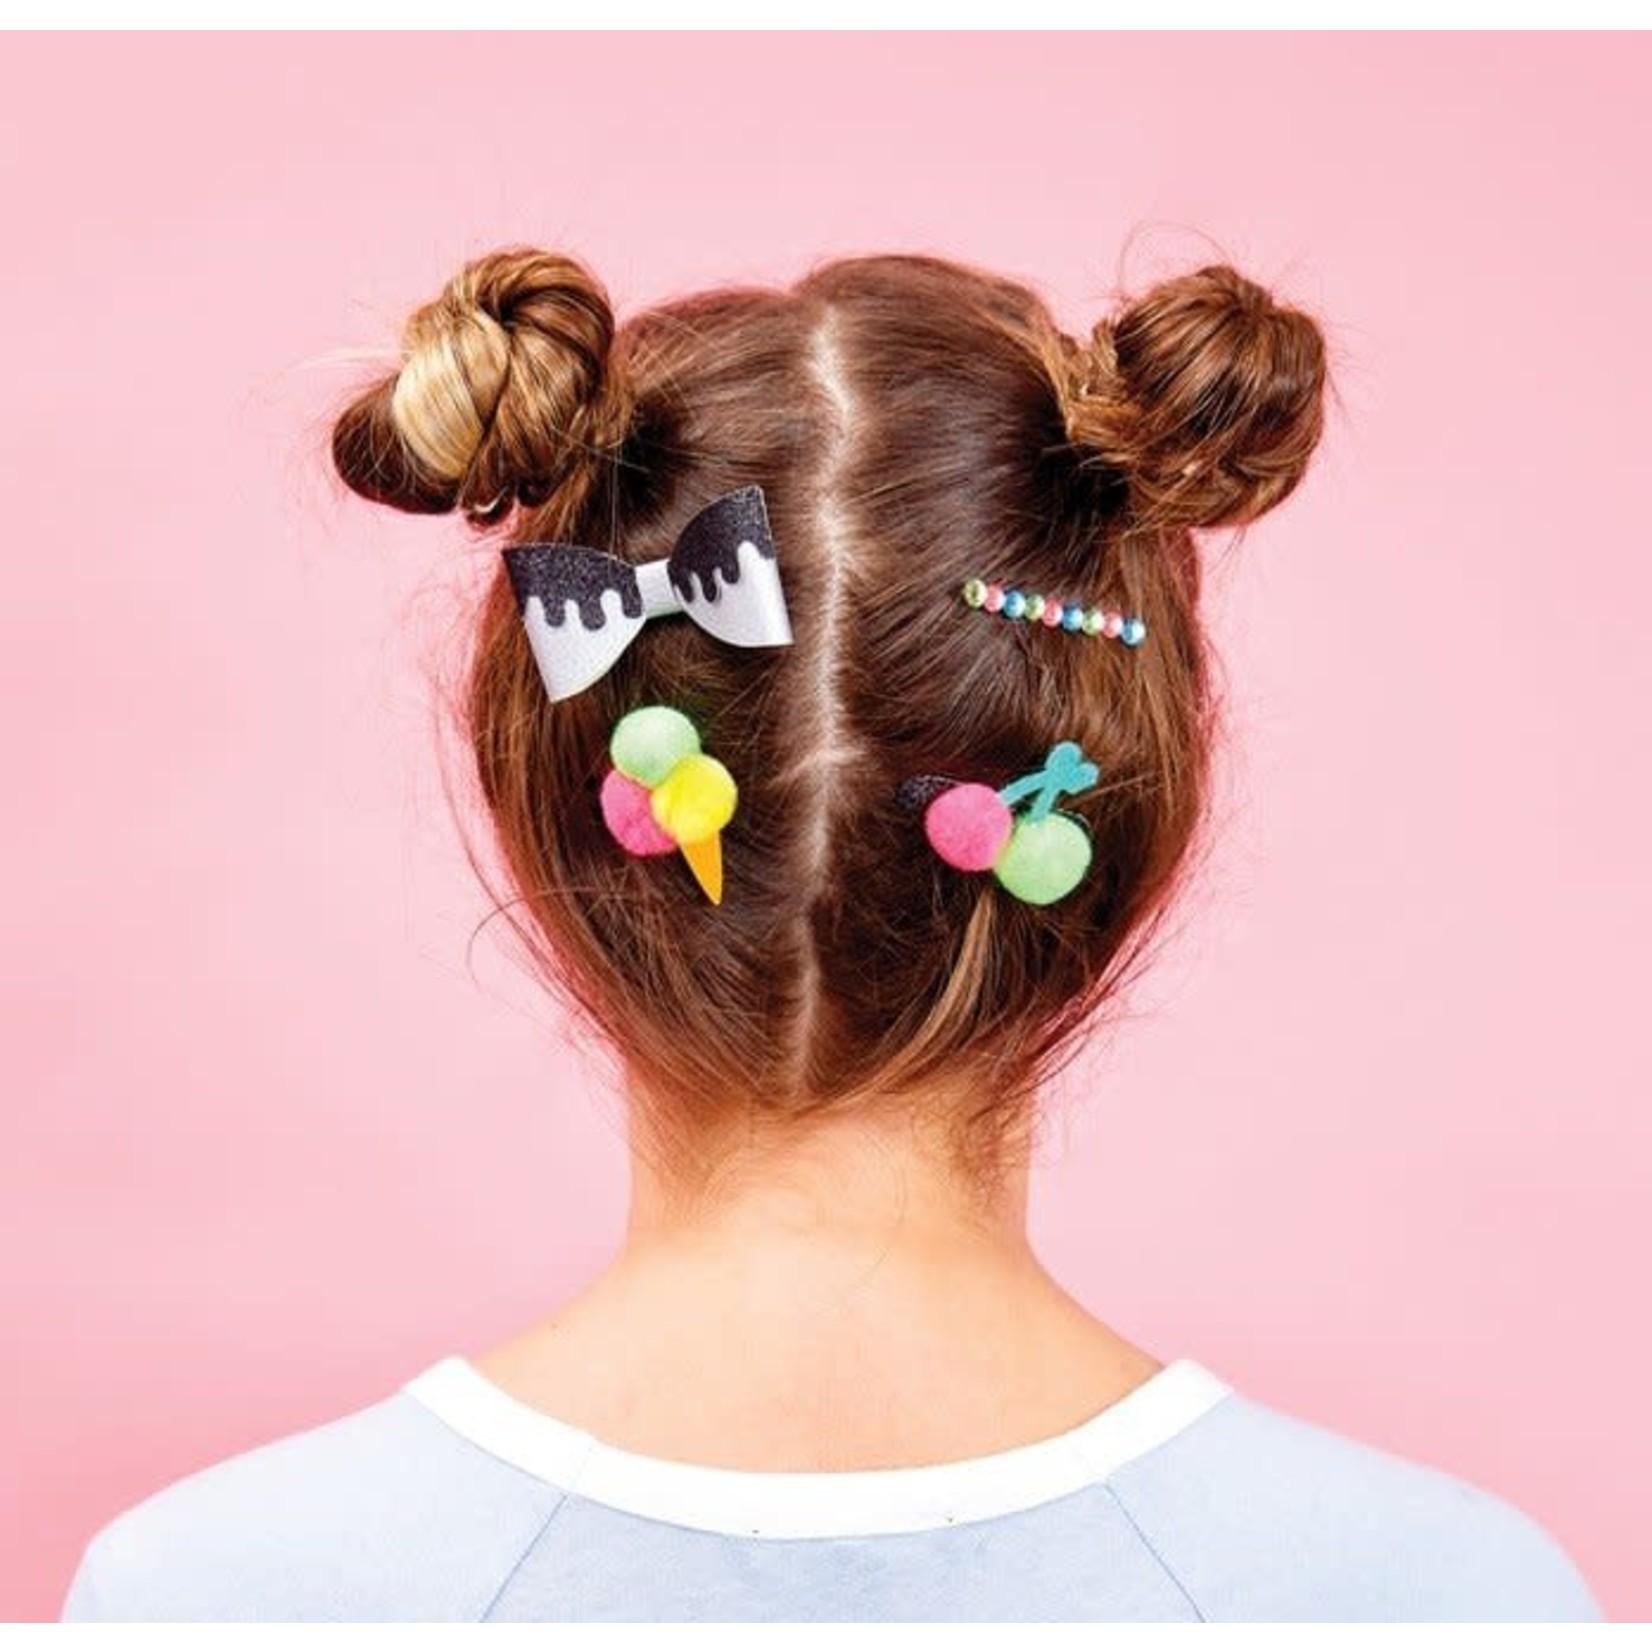 Klutz DIY Barrettes & Bows & Hair Ties